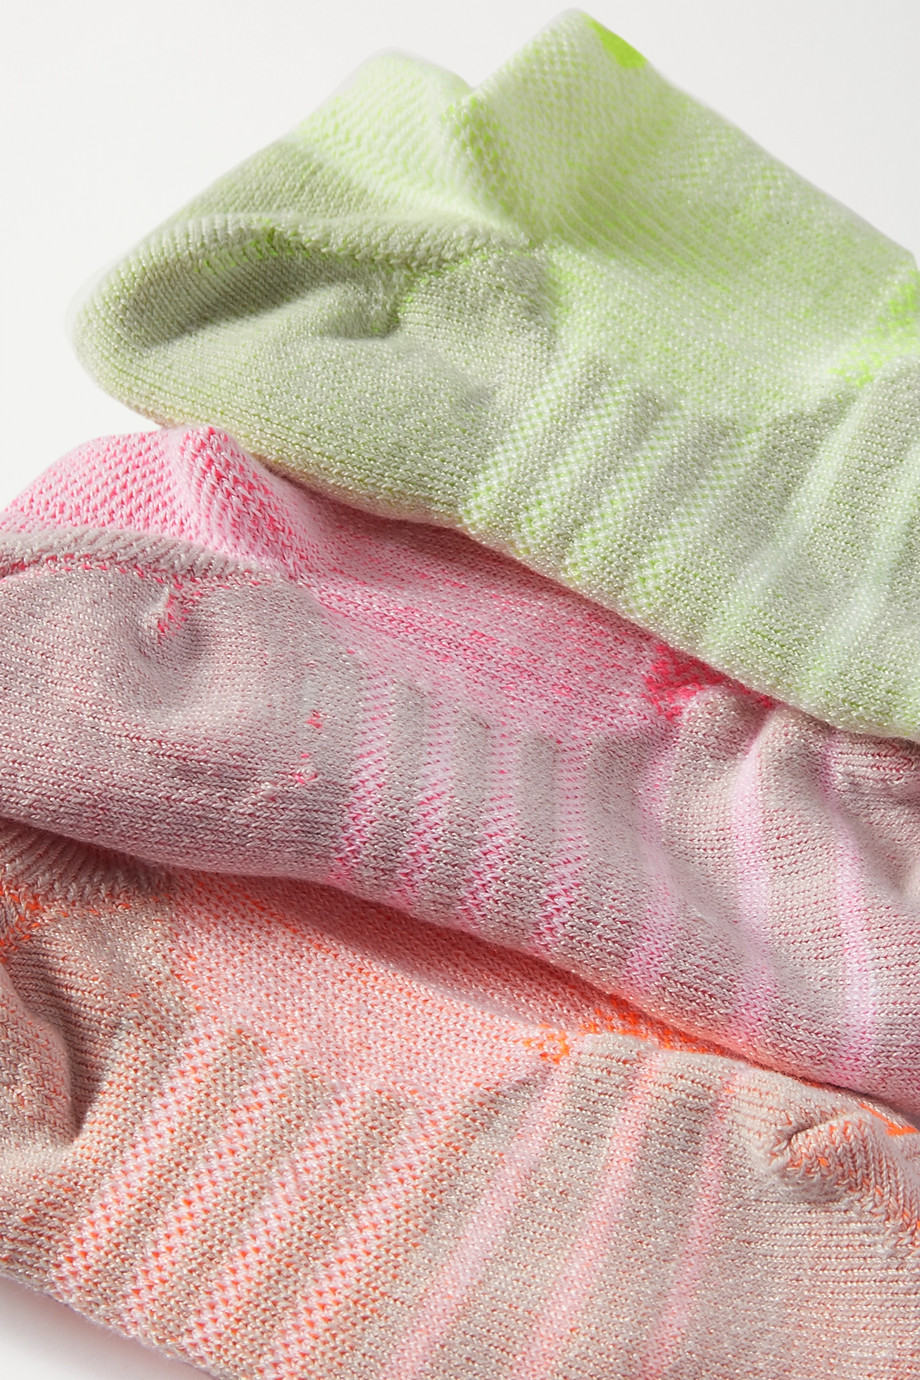 Nike Everyday Max Cushion set of three Dri-FIT socks